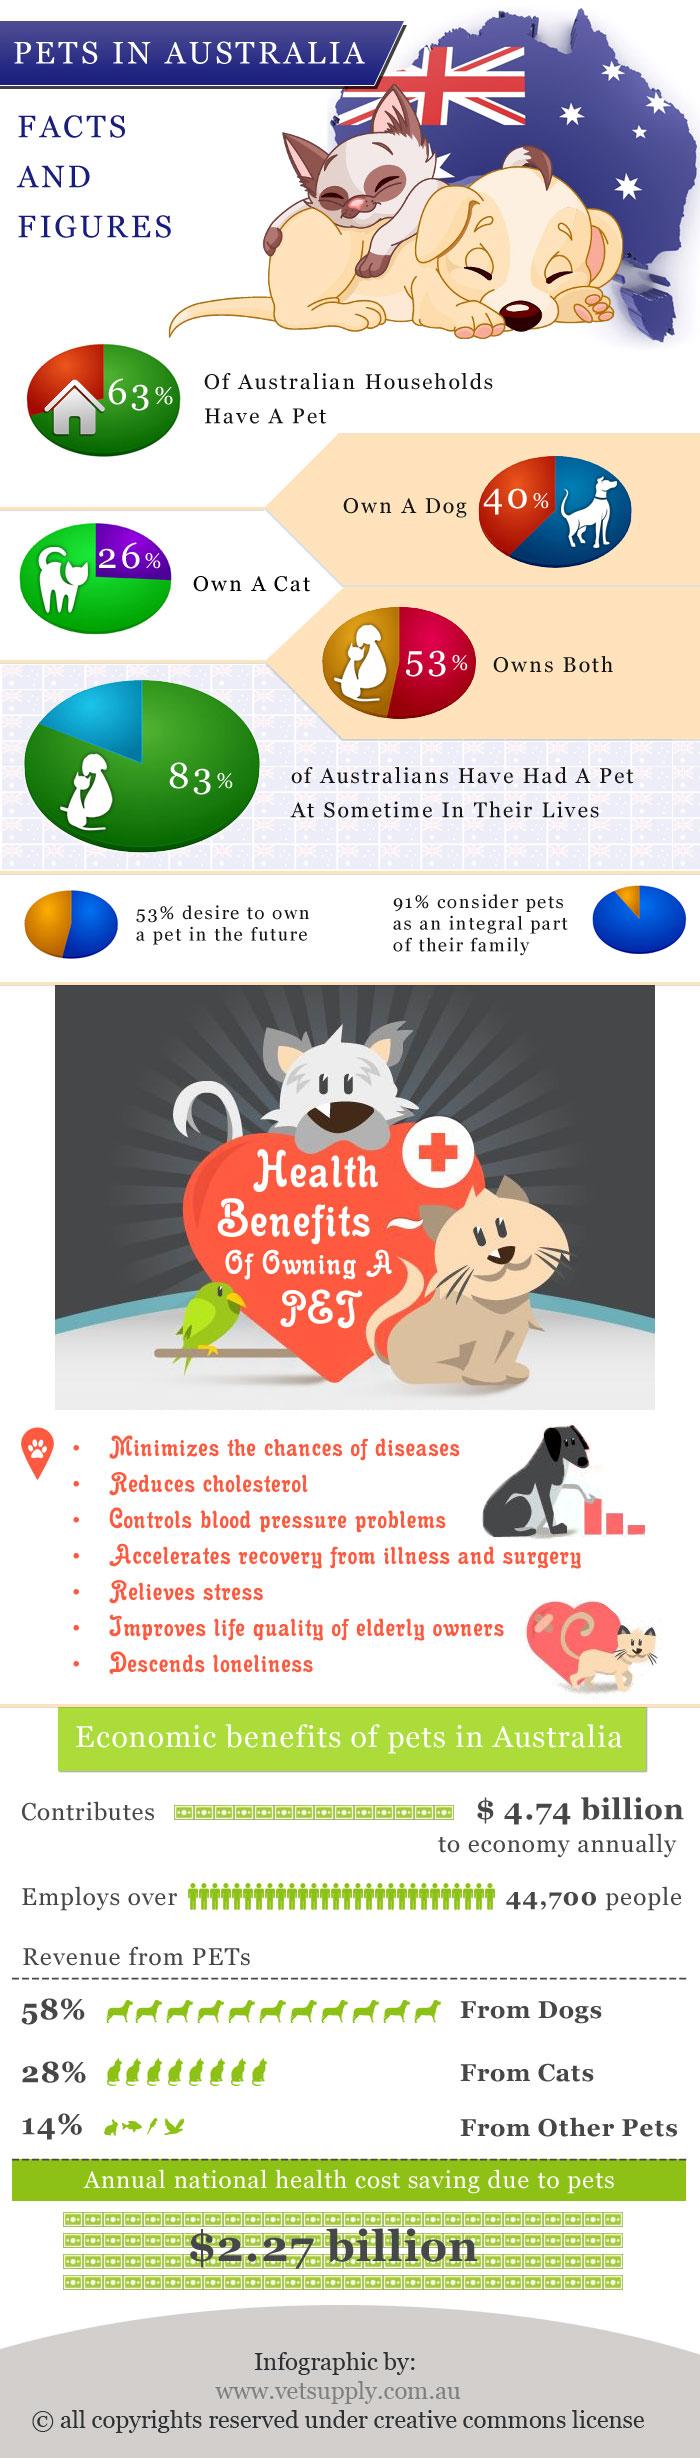 Dental Healthcare in Dogs